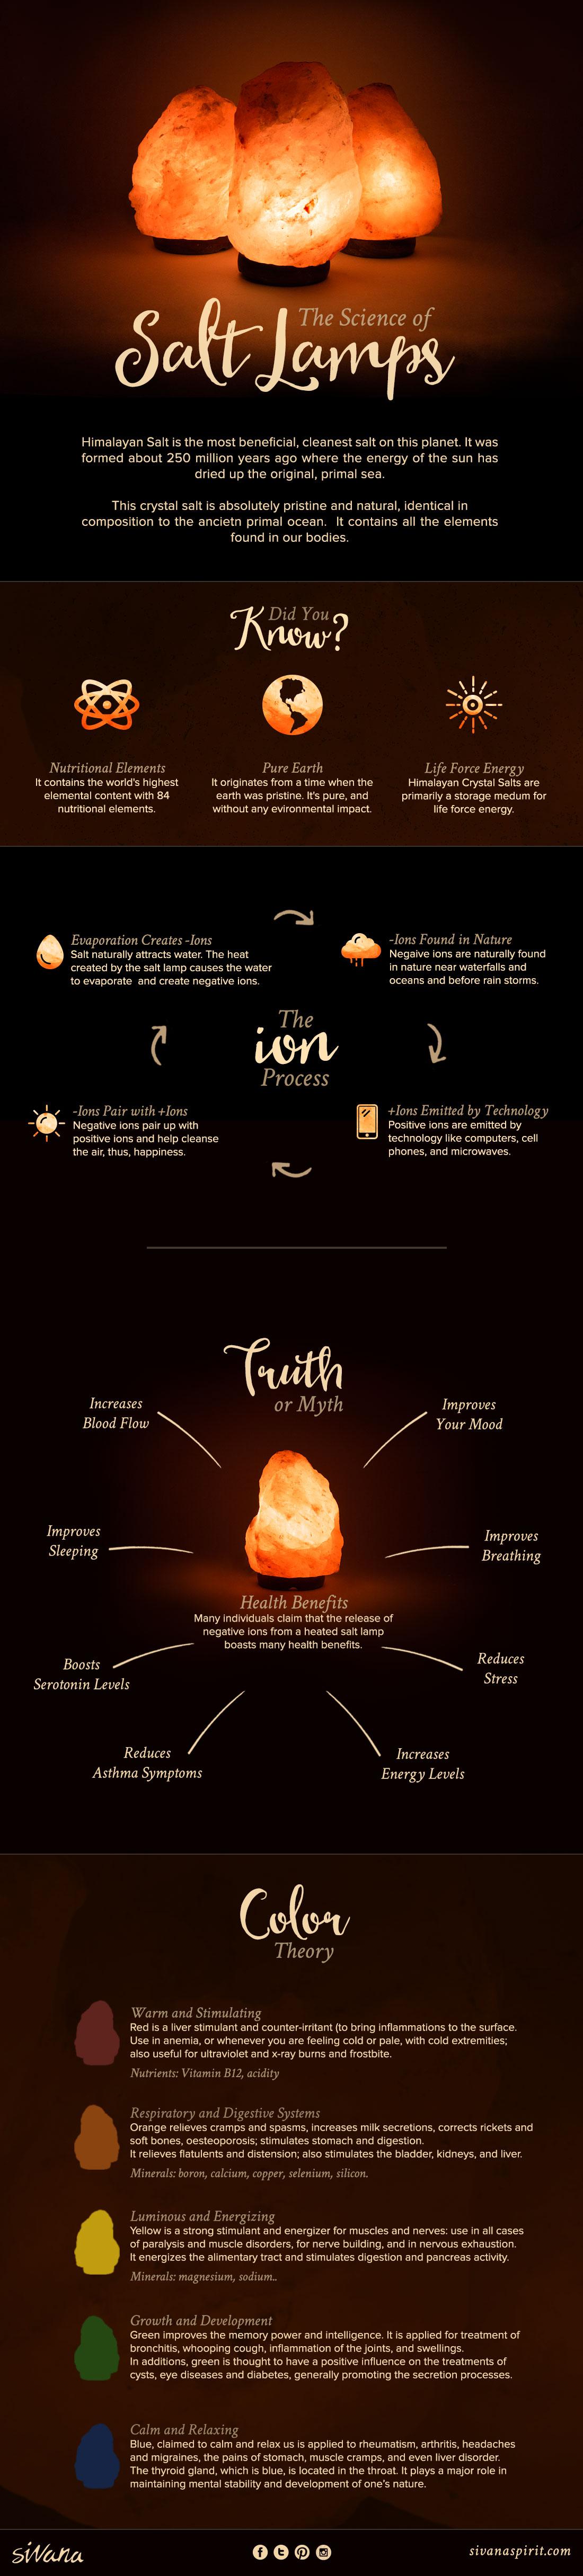 Sivana_Salt-Lamp_Infographic.jpg